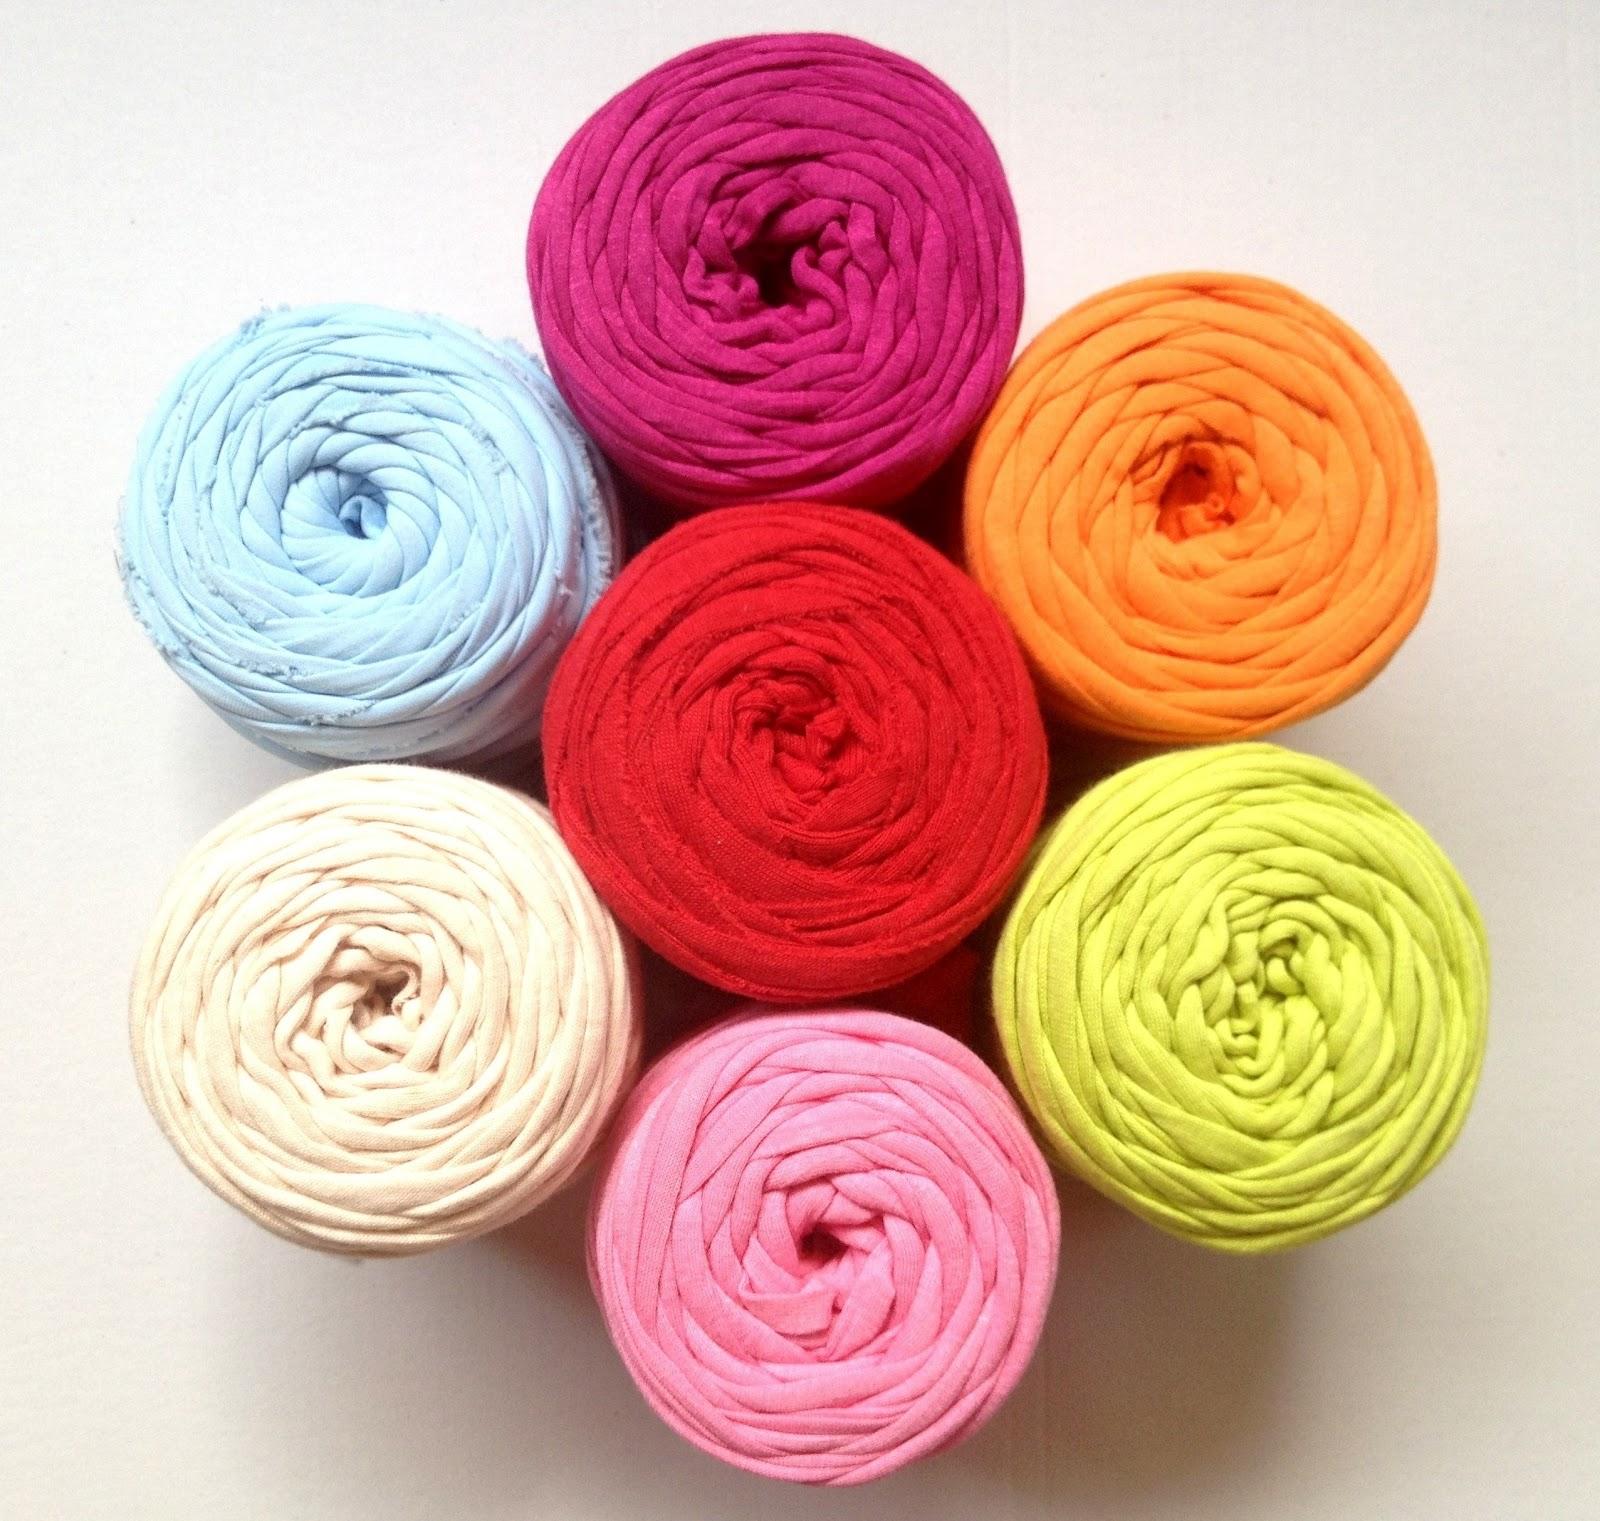 Lady crochet sobre el trapillo - Donde comprar trapillo barato ...